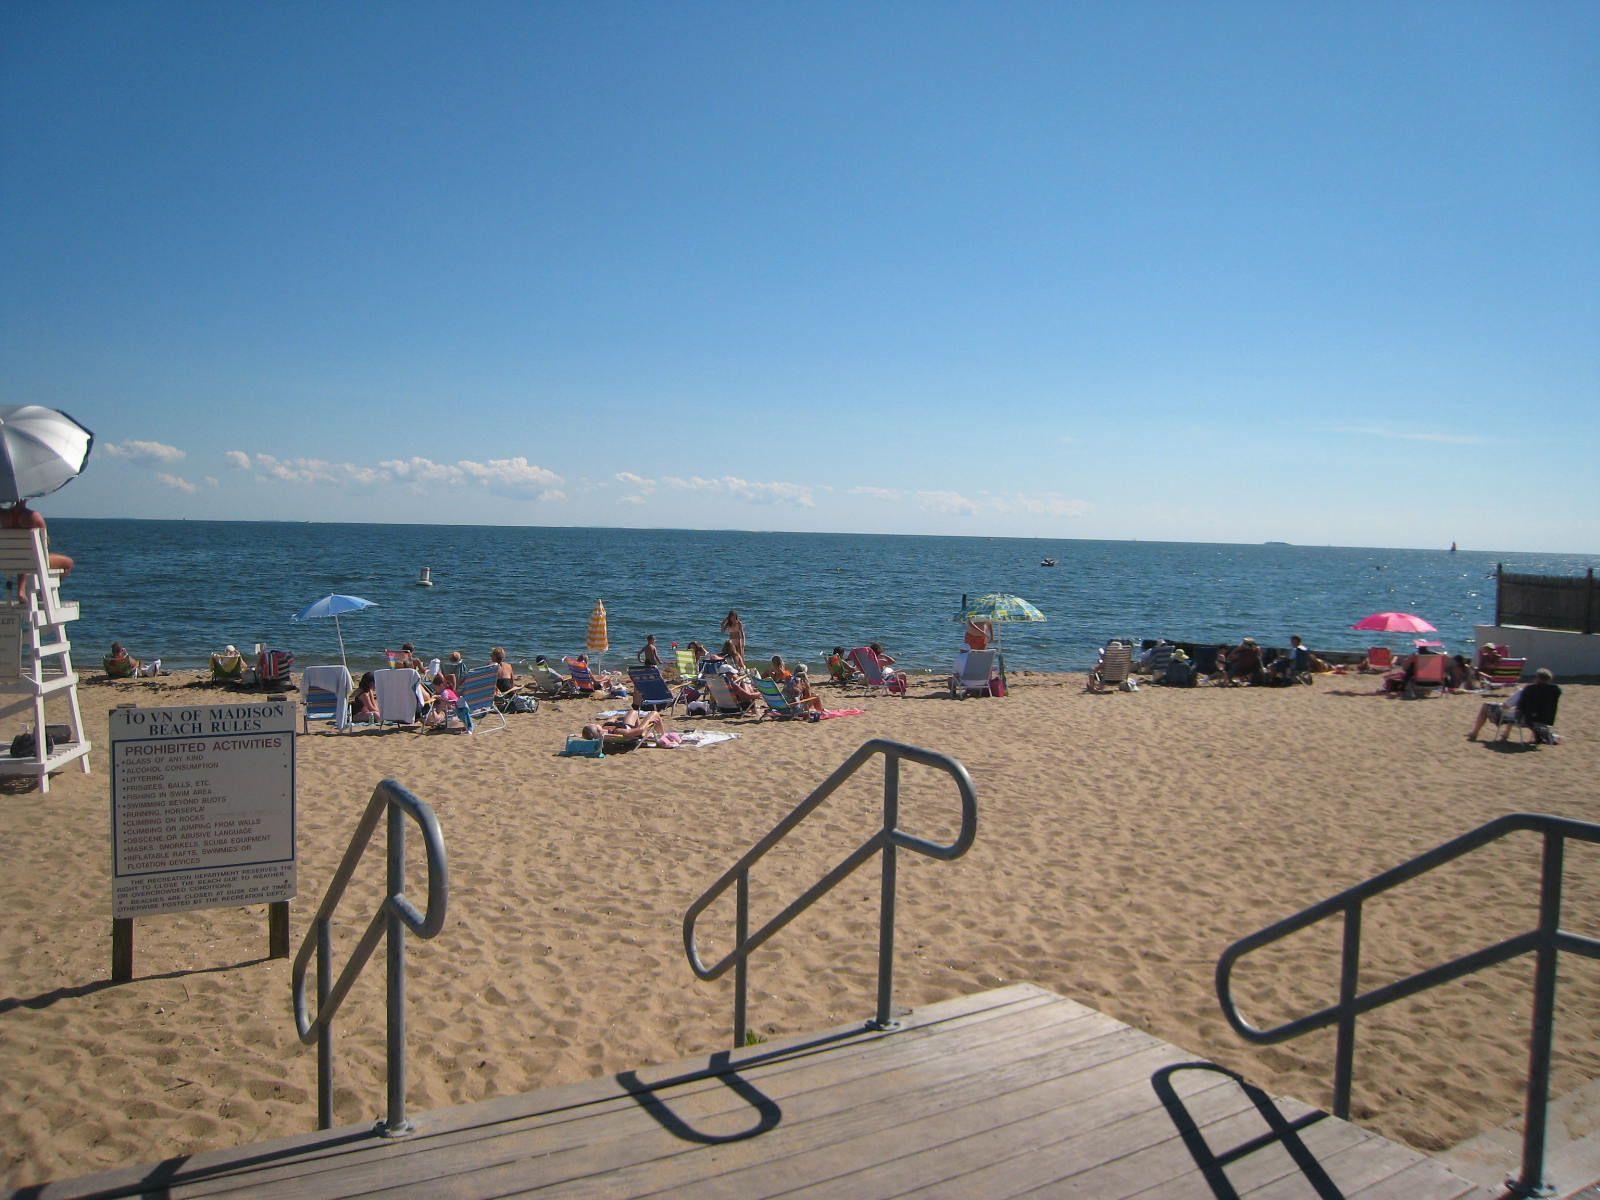 East Wharf Beach, Madison CT Connecticut usa